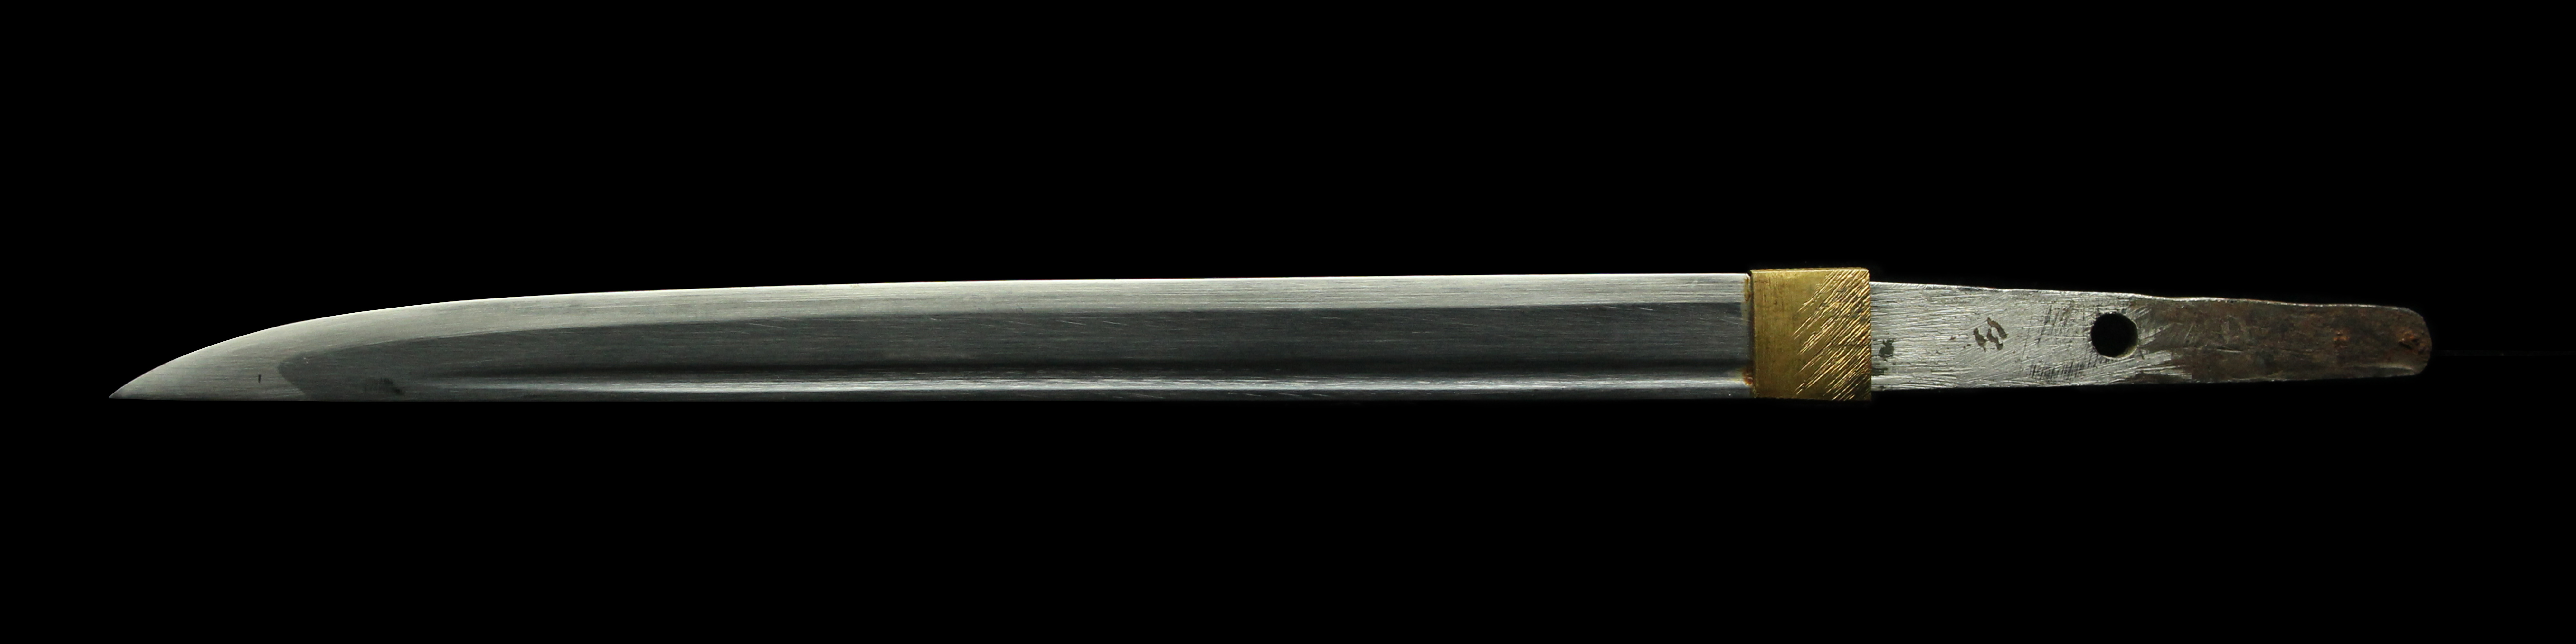 03-077